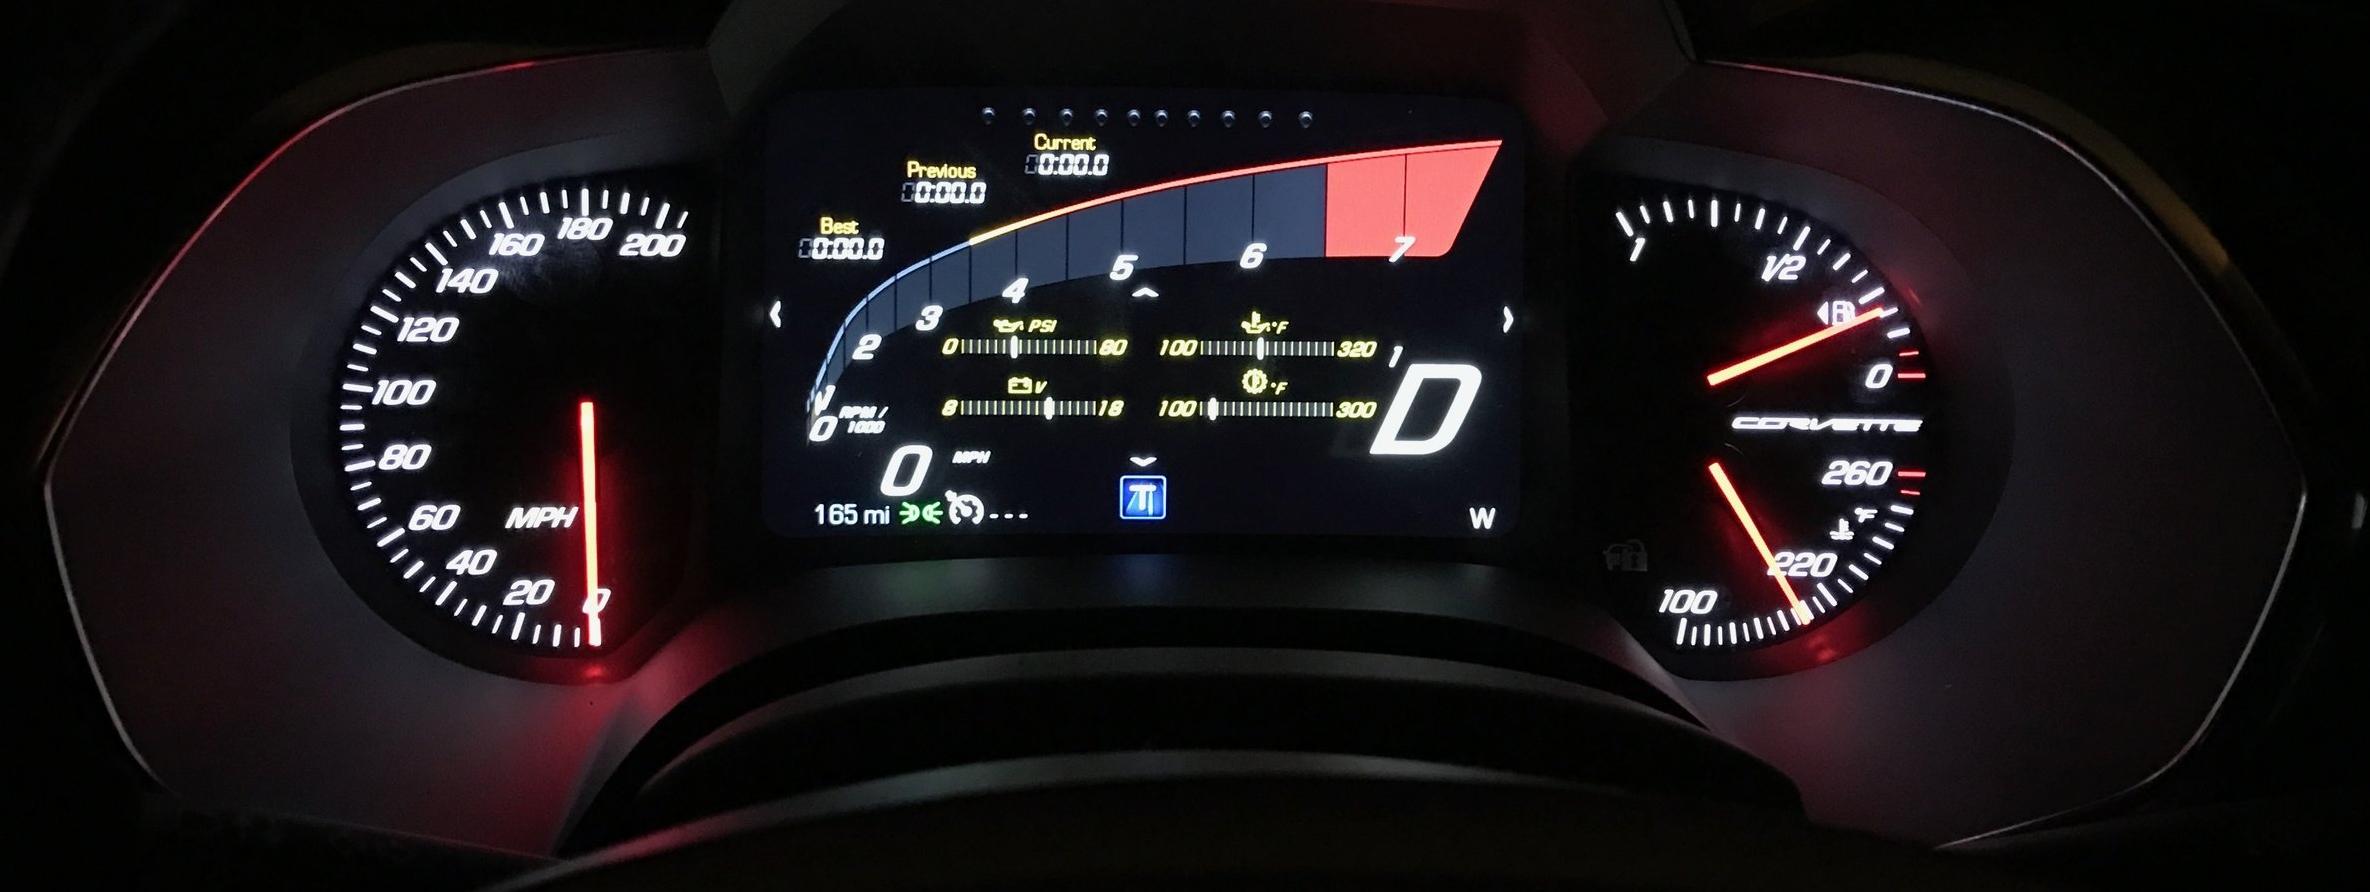 The configurable digital dash is bright, flexible, and responsive; an excellent design.  (Image:  KanonOnCars.com)